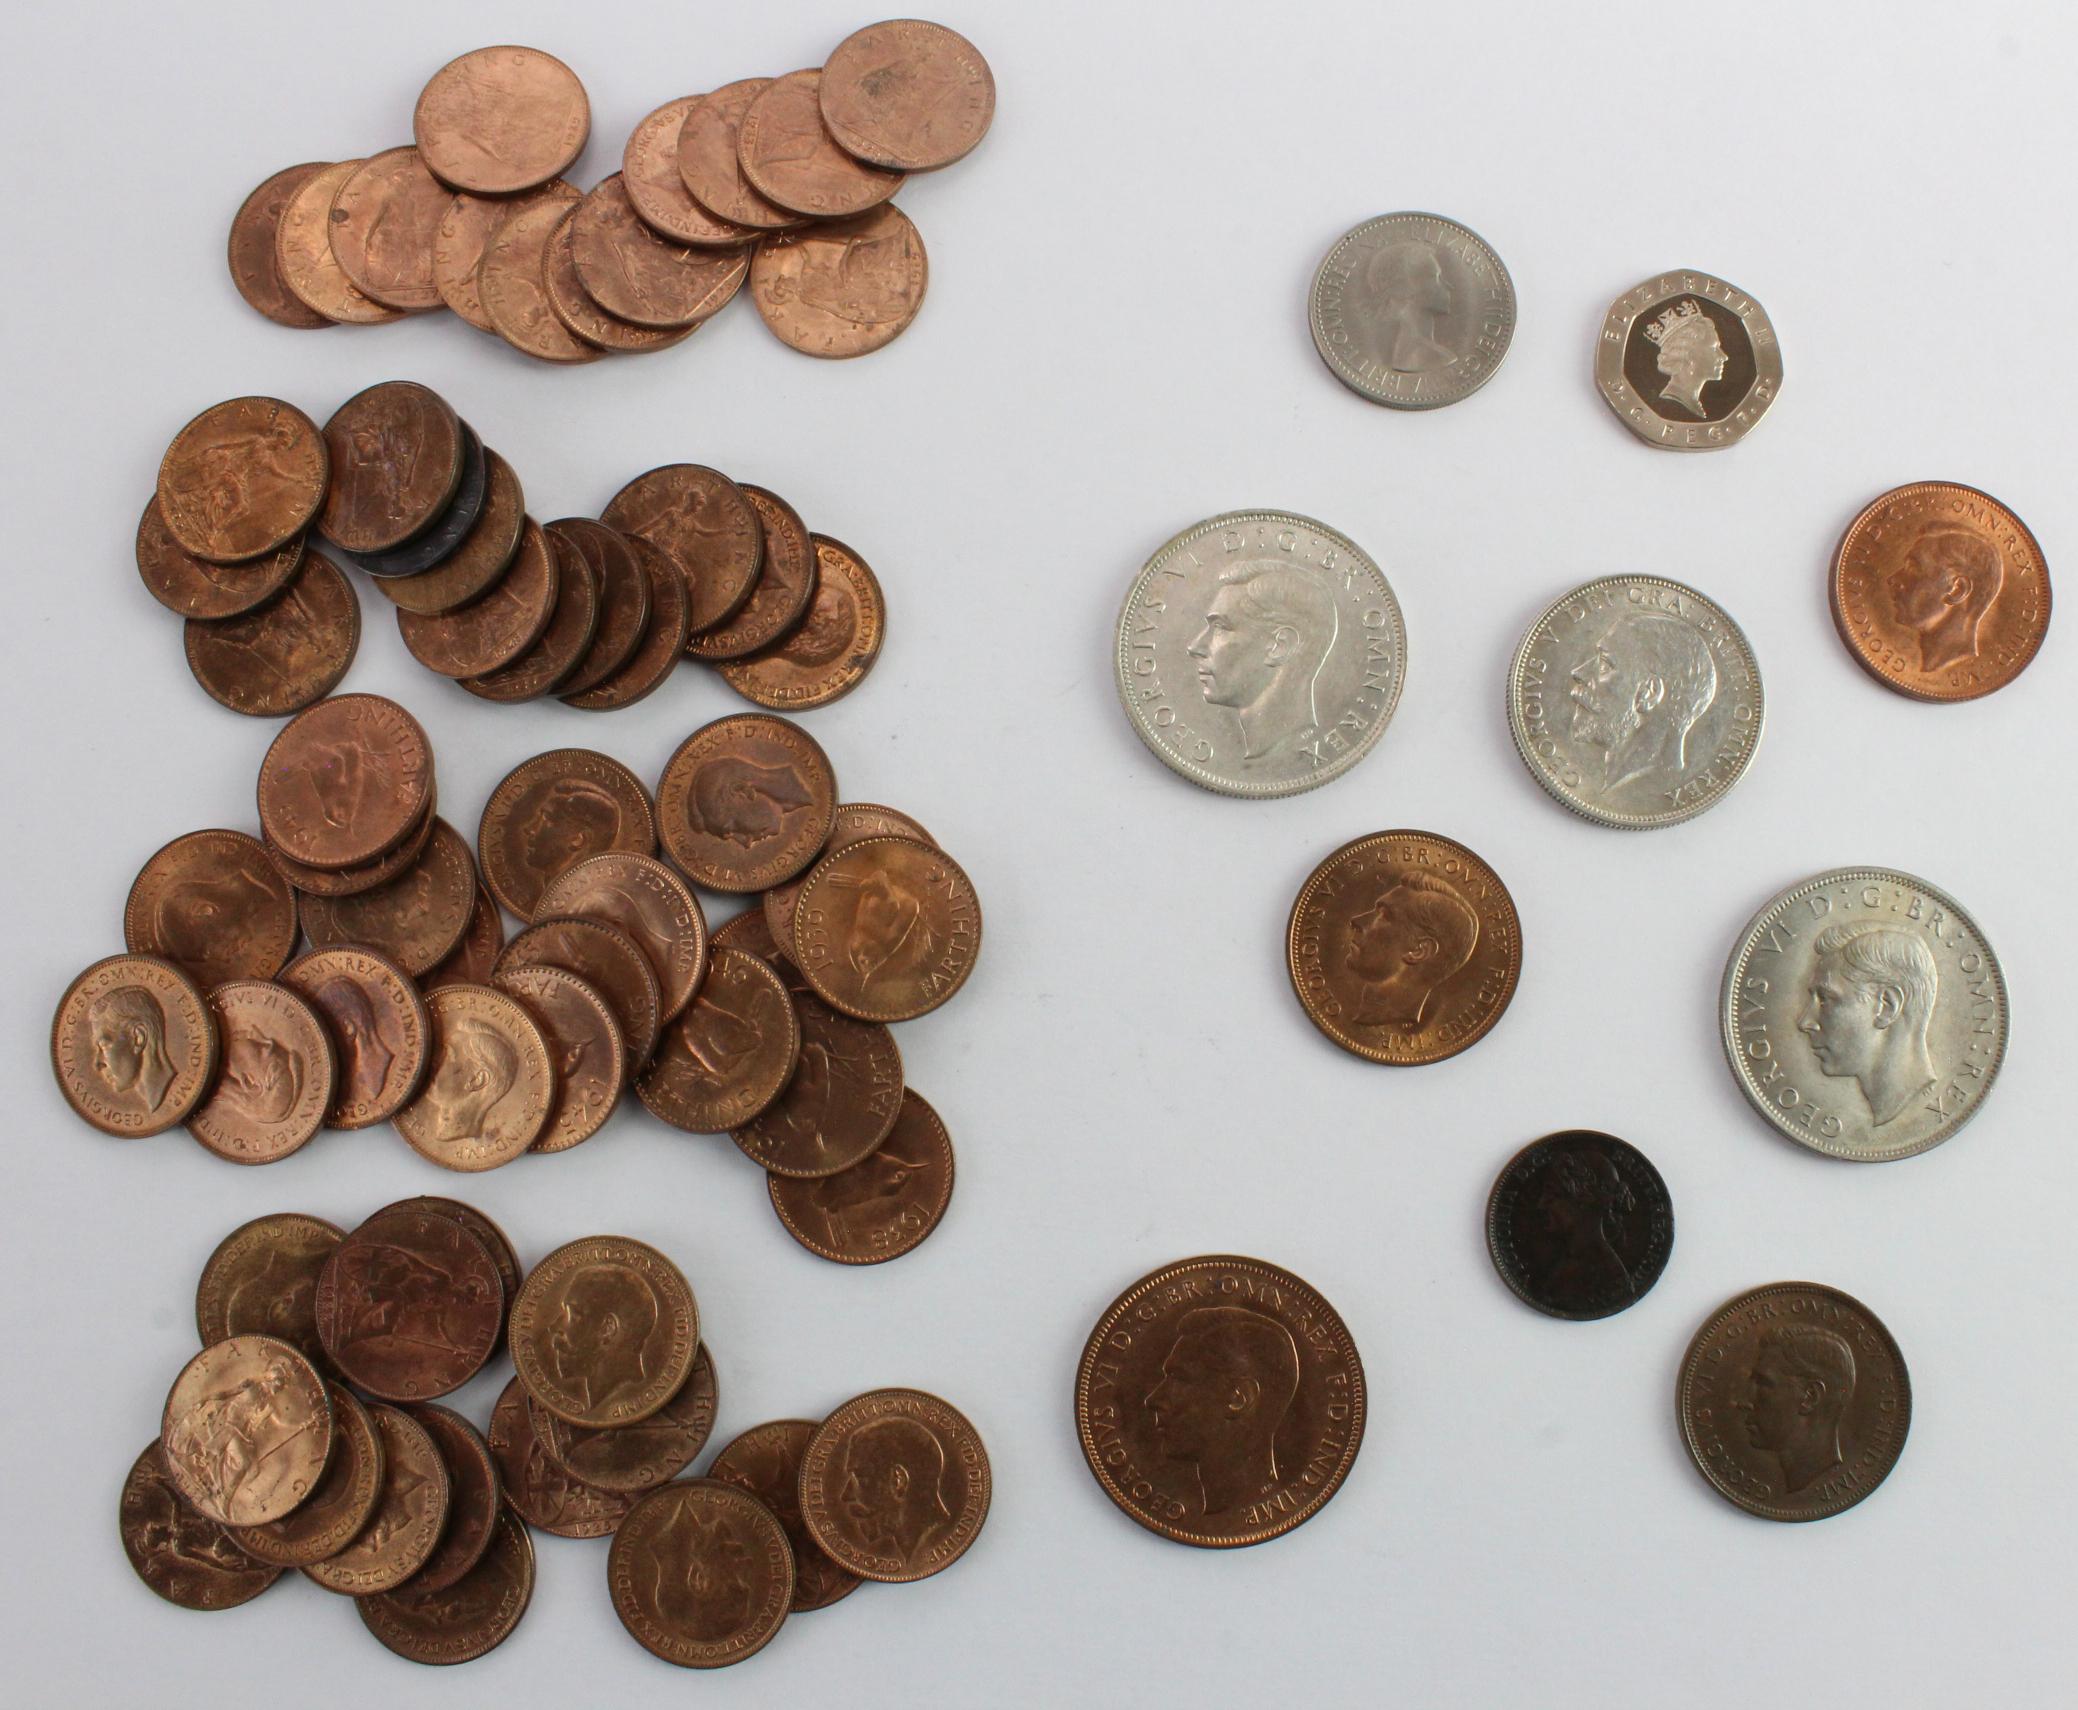 GB Coins (71): Halfcrown 1943 UNC, 1949 UNC; Florin 1928 UNC; Shilling 1953 UNC; Penny 1940 BU;